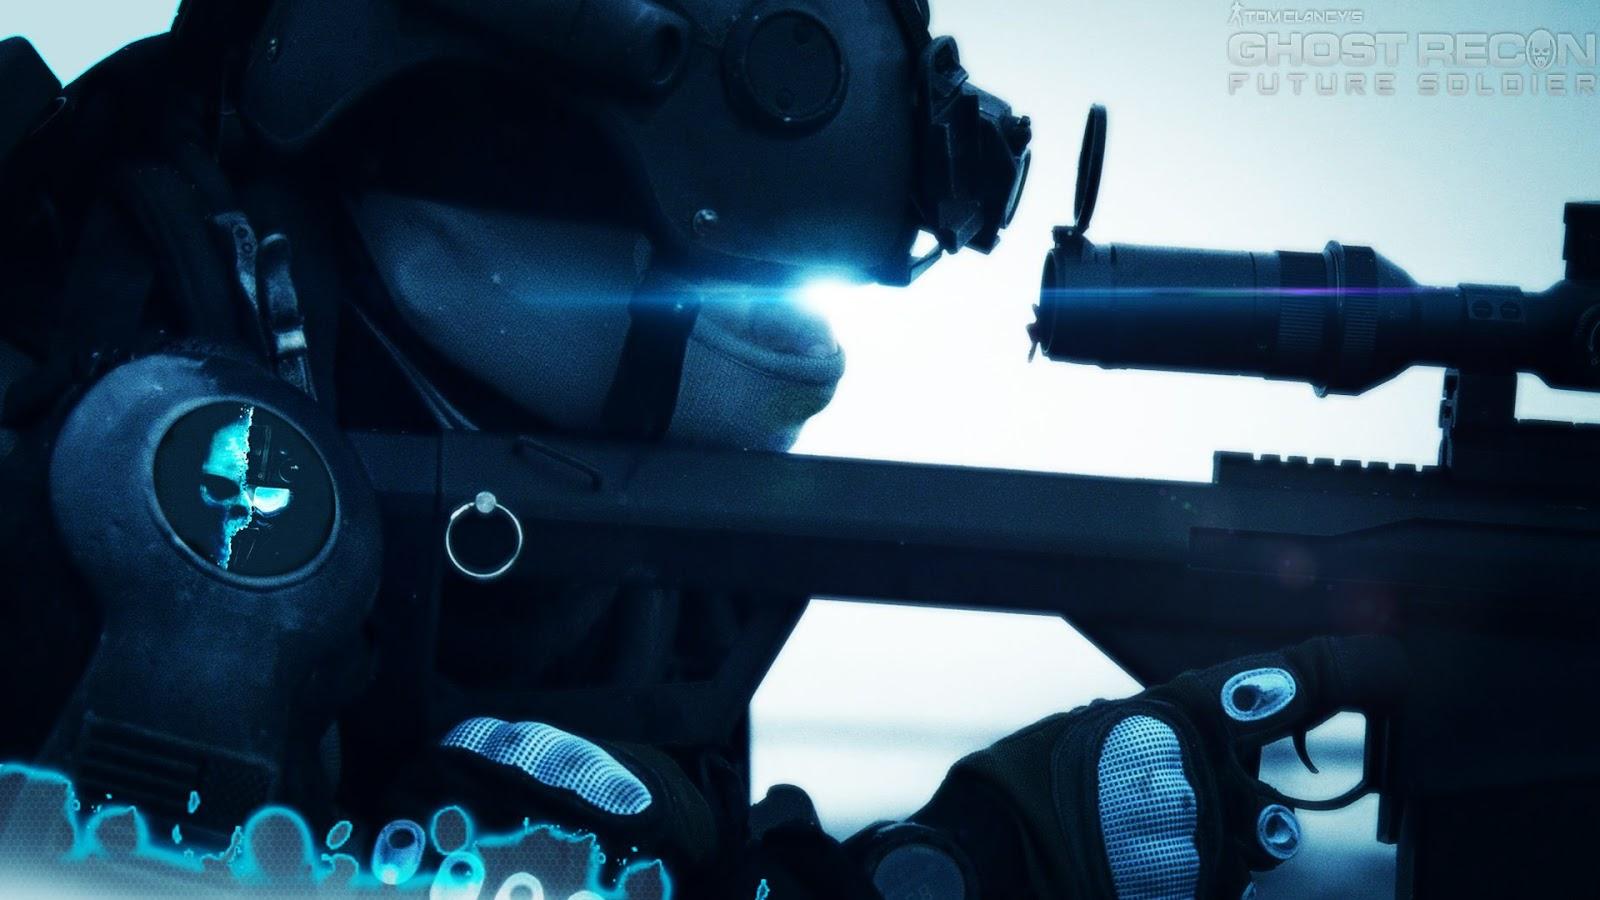 http://1.bp.blogspot.com/-bkT3m5K245w/UKZ2f527ssI/AAAAAAAAGHY/Wa_xXvl2JT4/s1600/Ghost-Recon-Future-Soldier-HD-Sniper-Wallpaper_Vvallpaper.Net.jpg